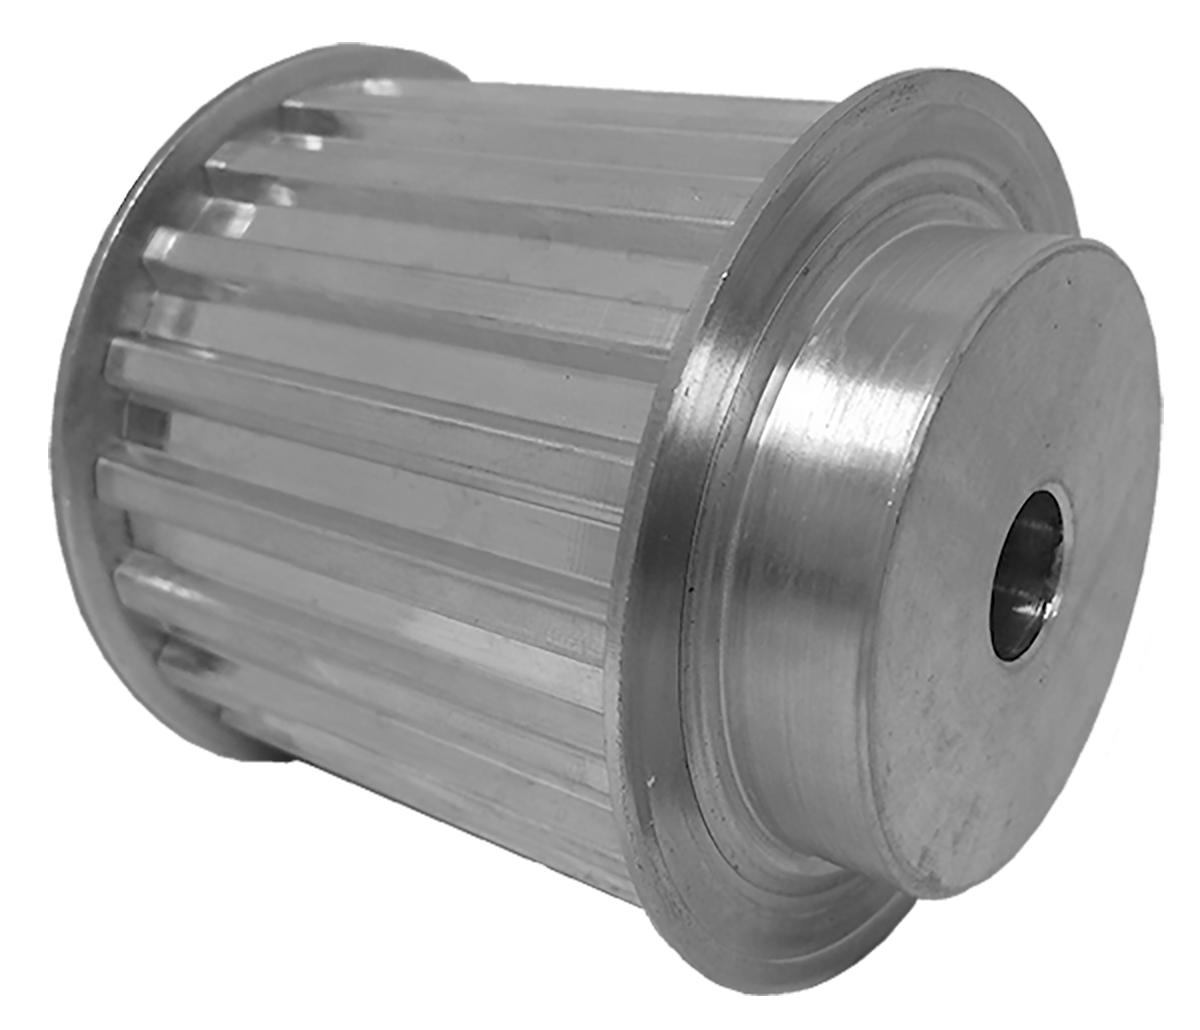 66T10/20-2 - Aluminum Metric Pulleys